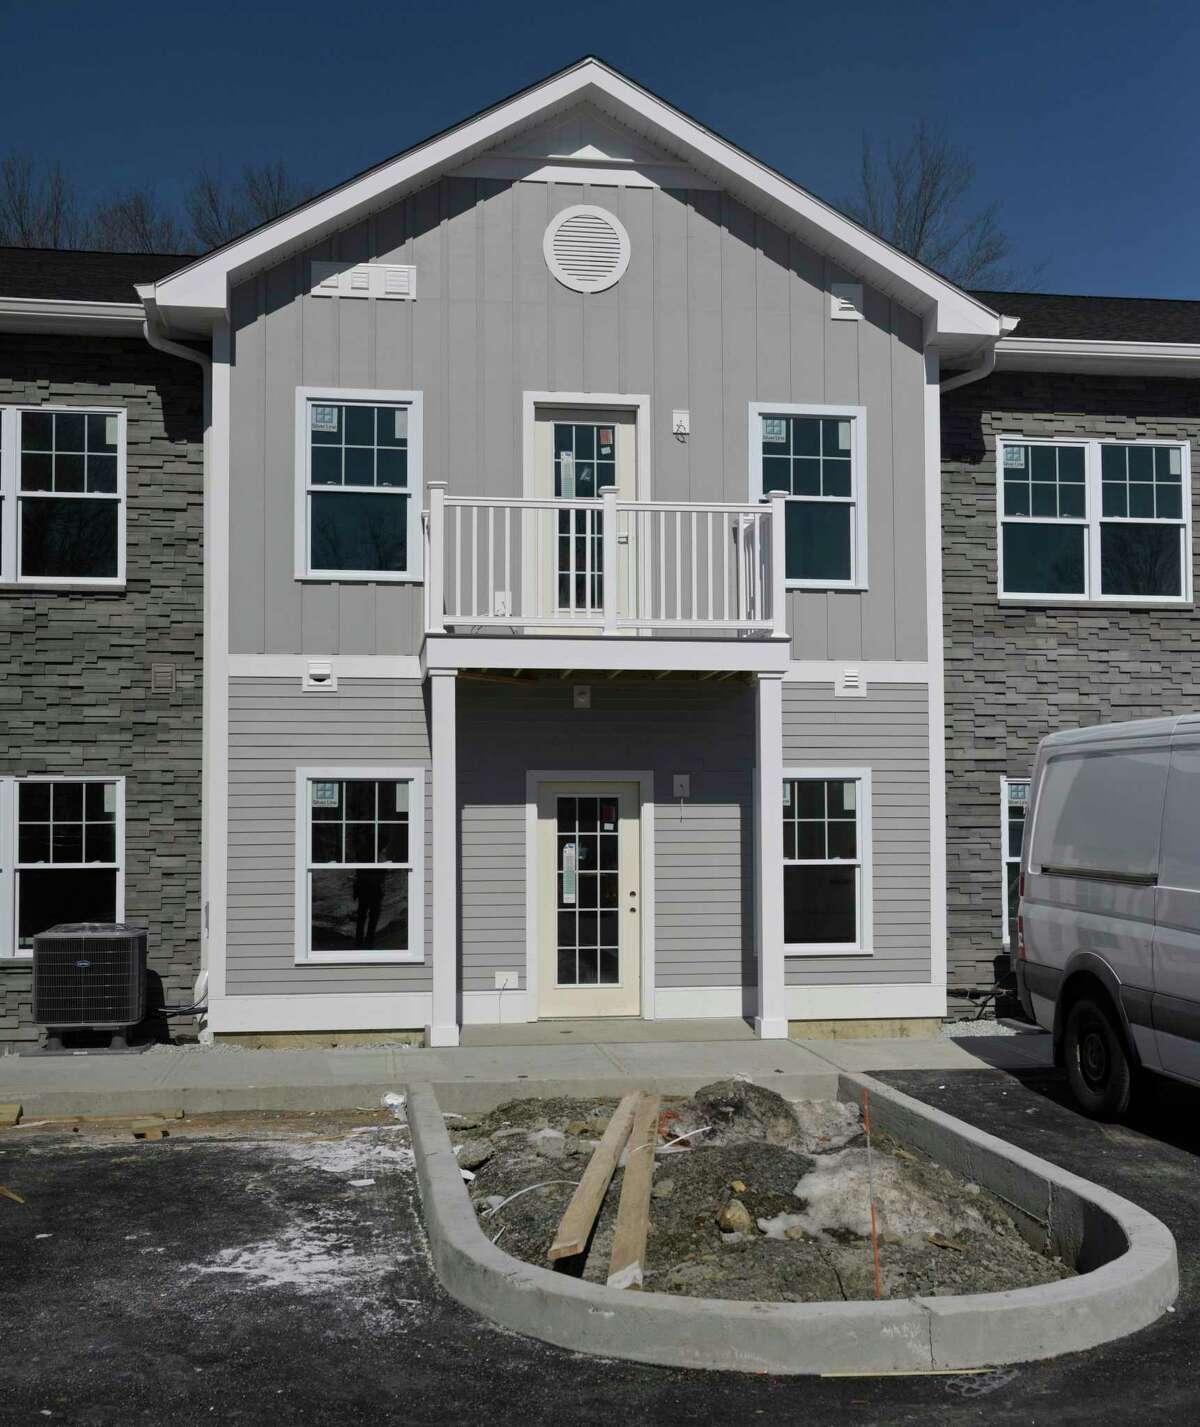 New residential development, Farrell Communities of Sandy Hook, in Newtown, Conn. Friday, February 26, 2021.